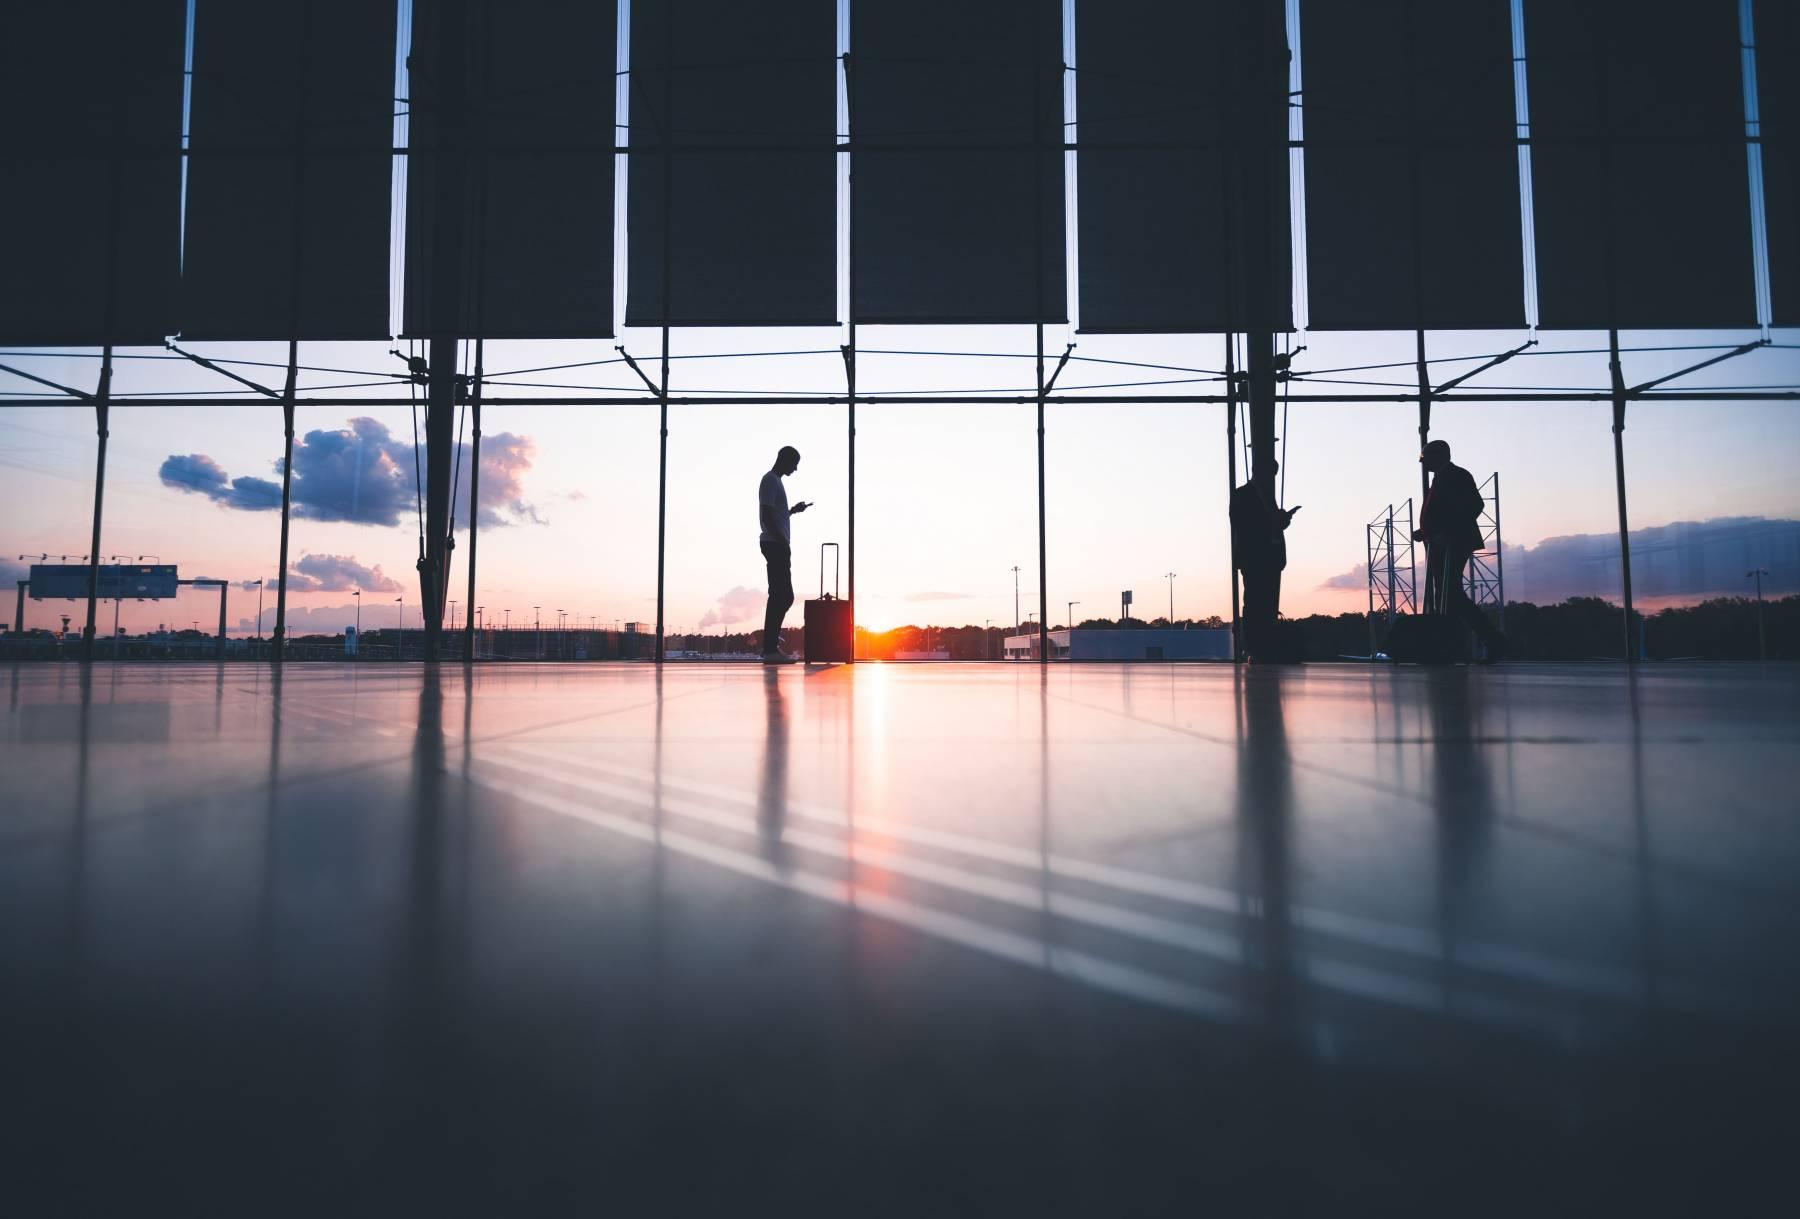 location de voiture aeroport malaga